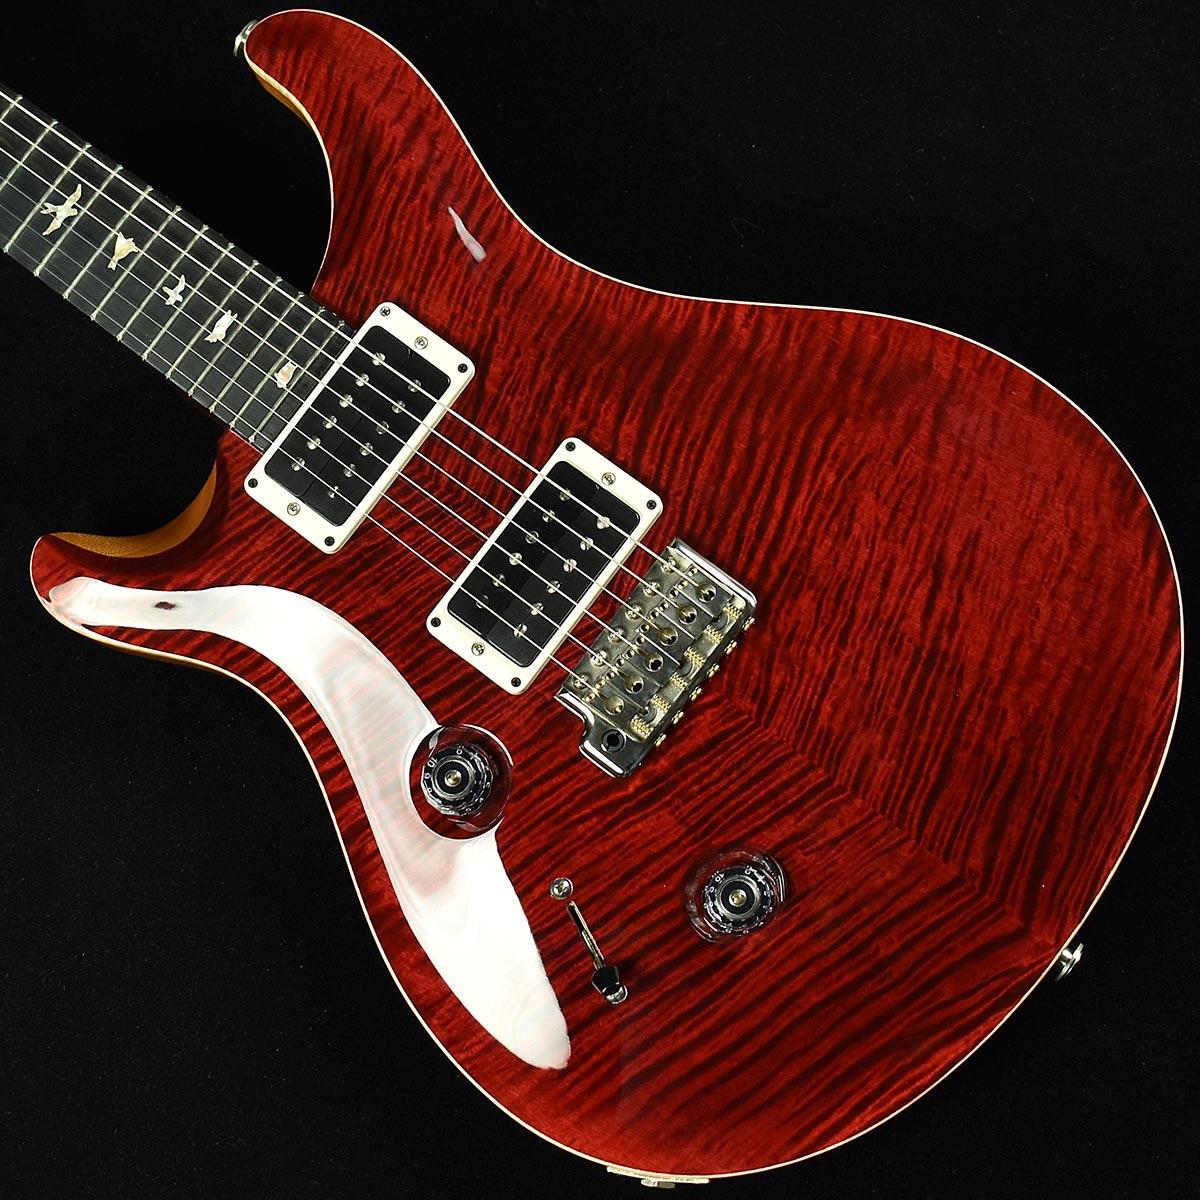 PRS Custom24 Lefty Black Cherry 10Top S/N:251644 【ポールリードスミス(Paul Reed Smith) レフティ】